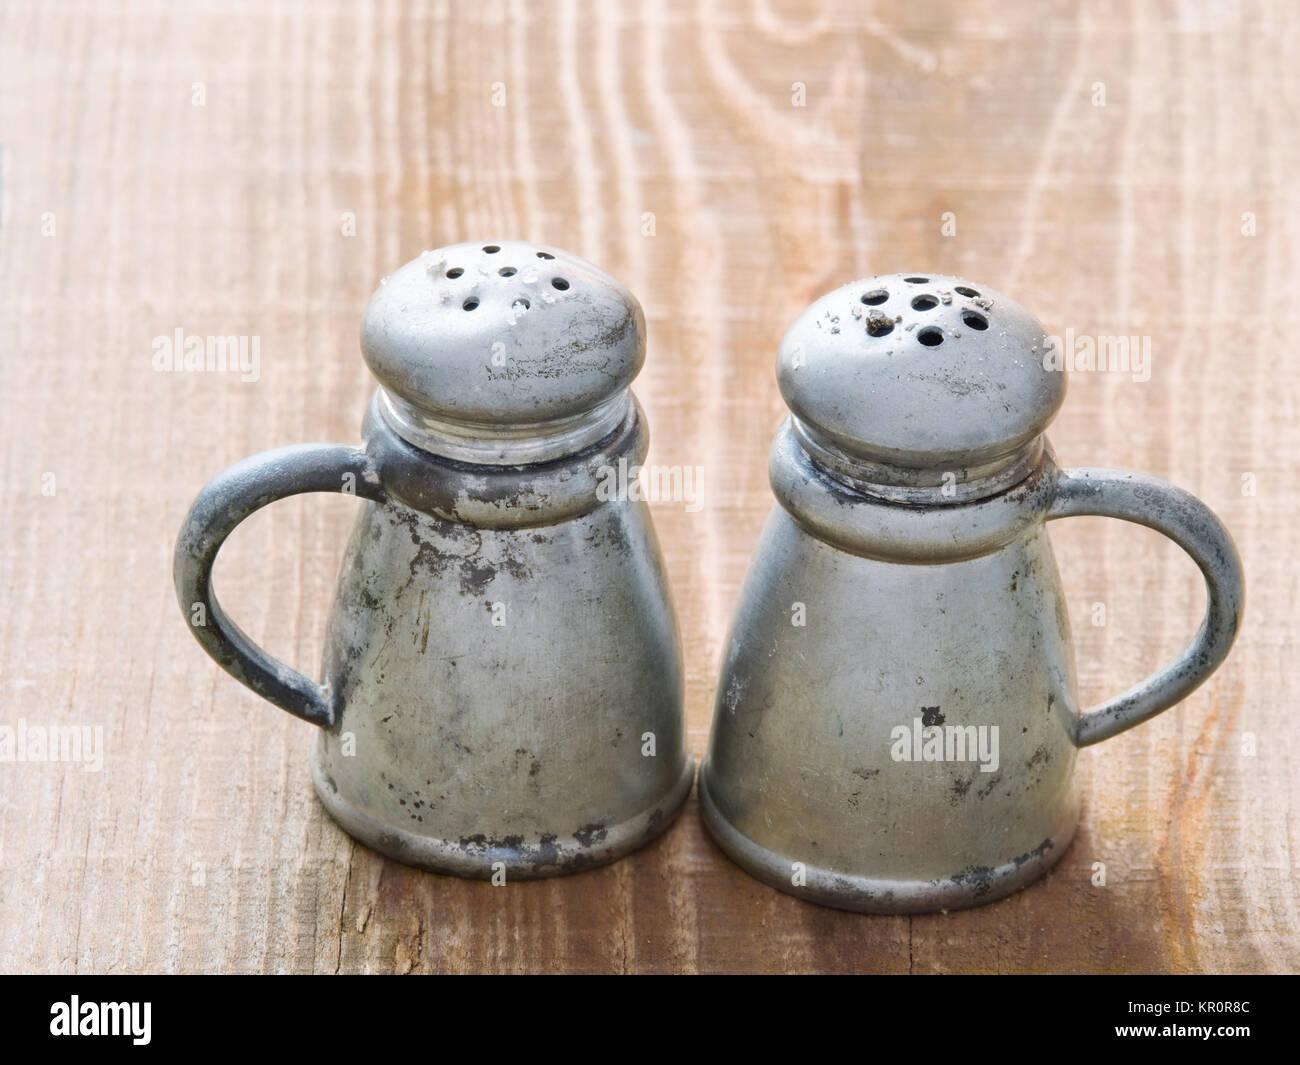 rustic salt and pepper shaker stock photo: 169048668 - alamy